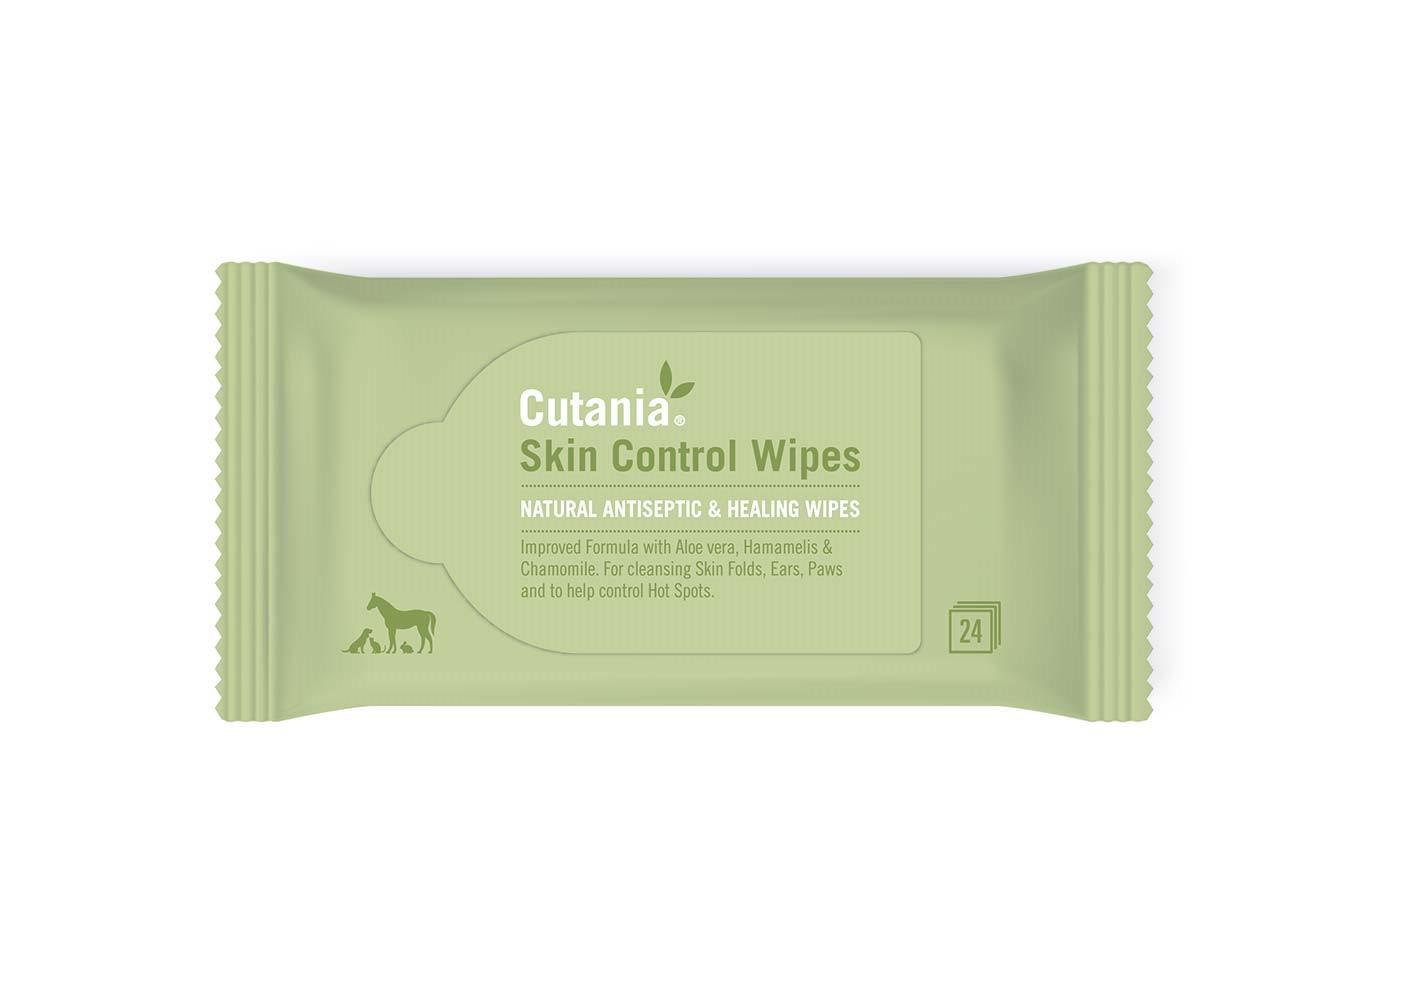 CUTANIA SKIN CONTROL WIPES 24 UDS